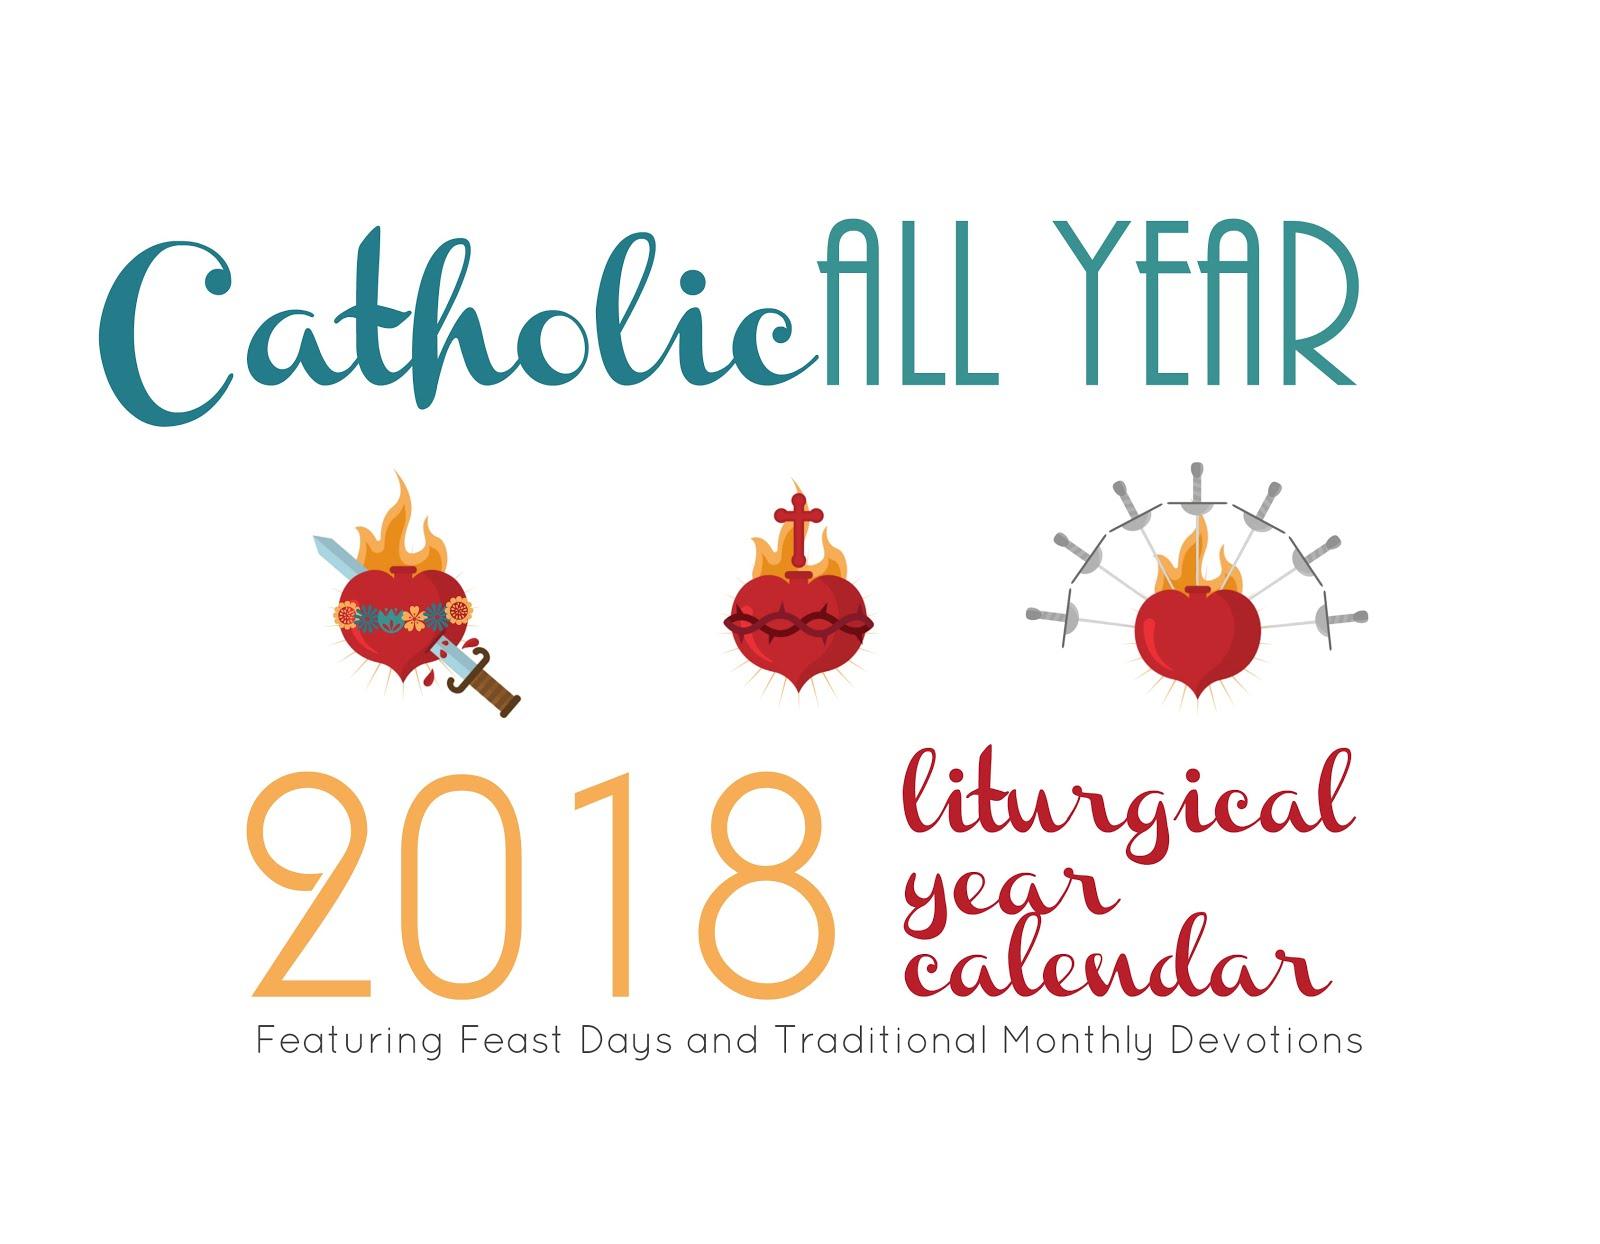 My Wall Calendar